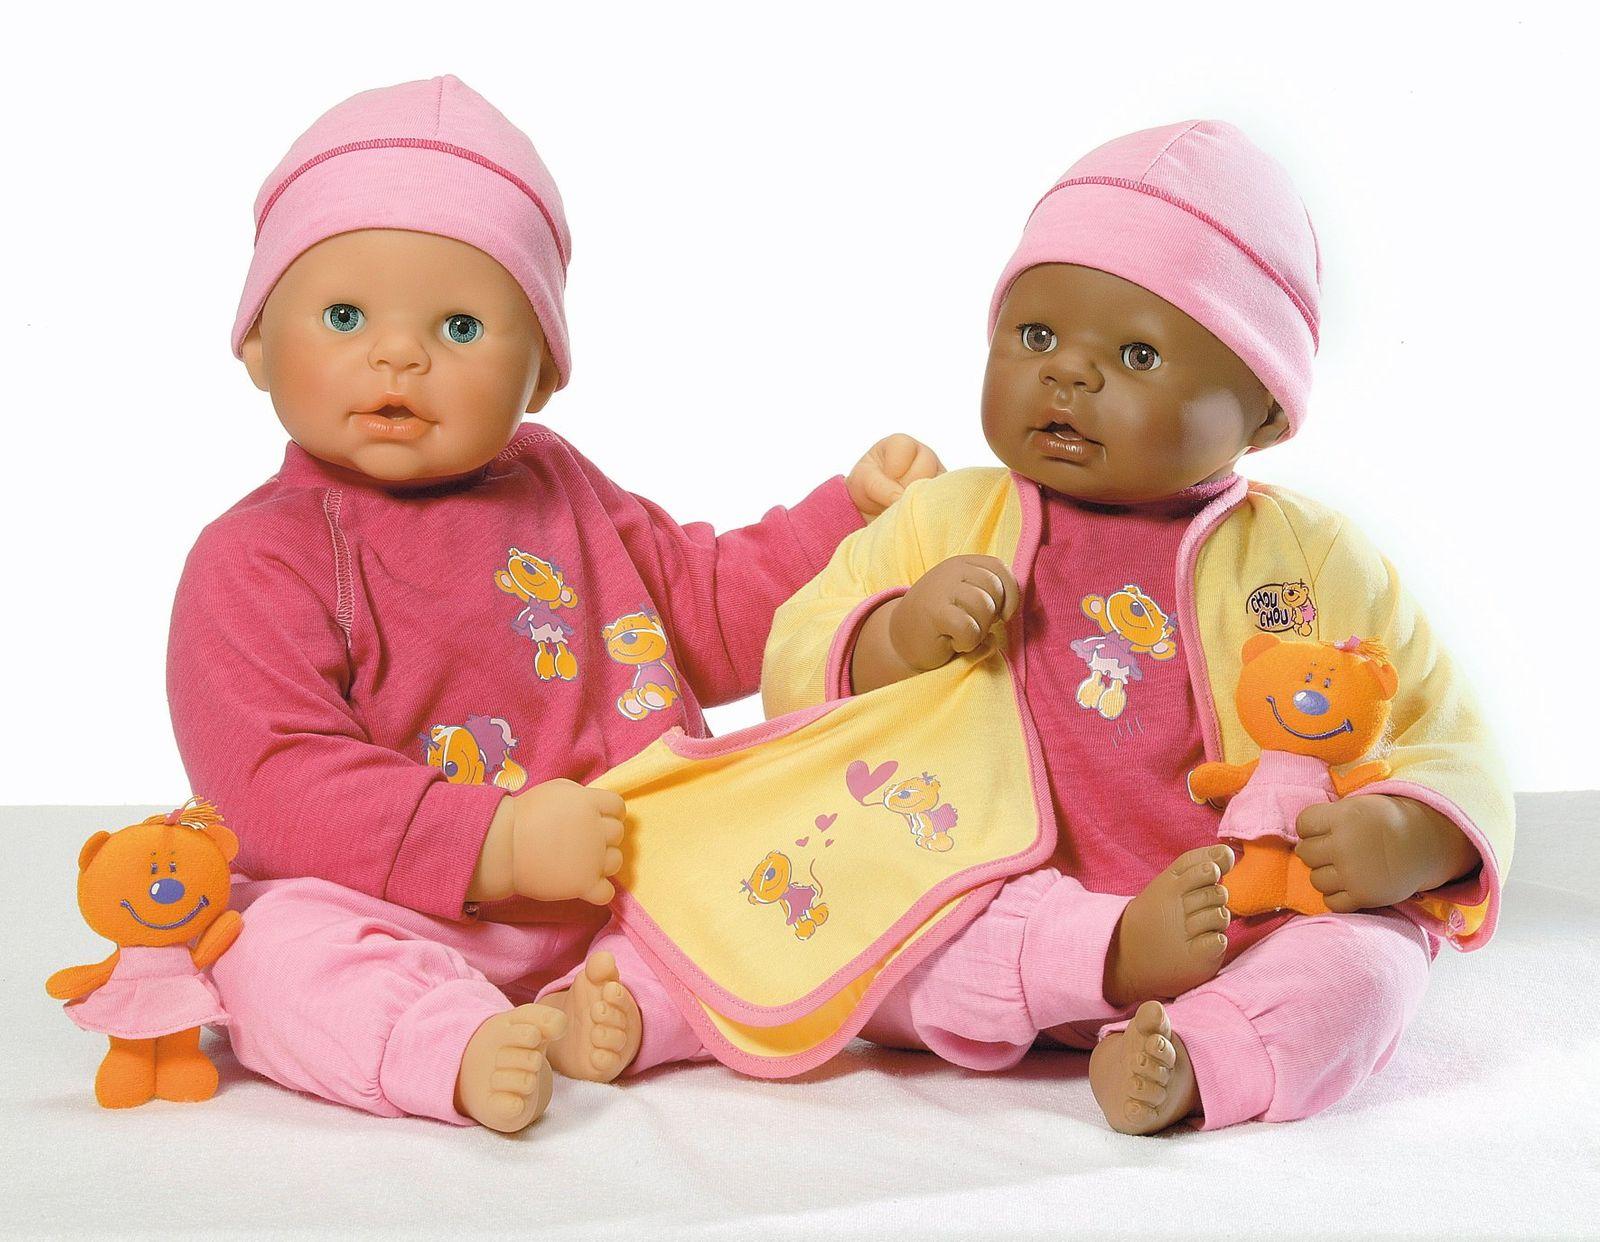 Zapf Creation / Puppen Chou Chou / Baby-Puppen